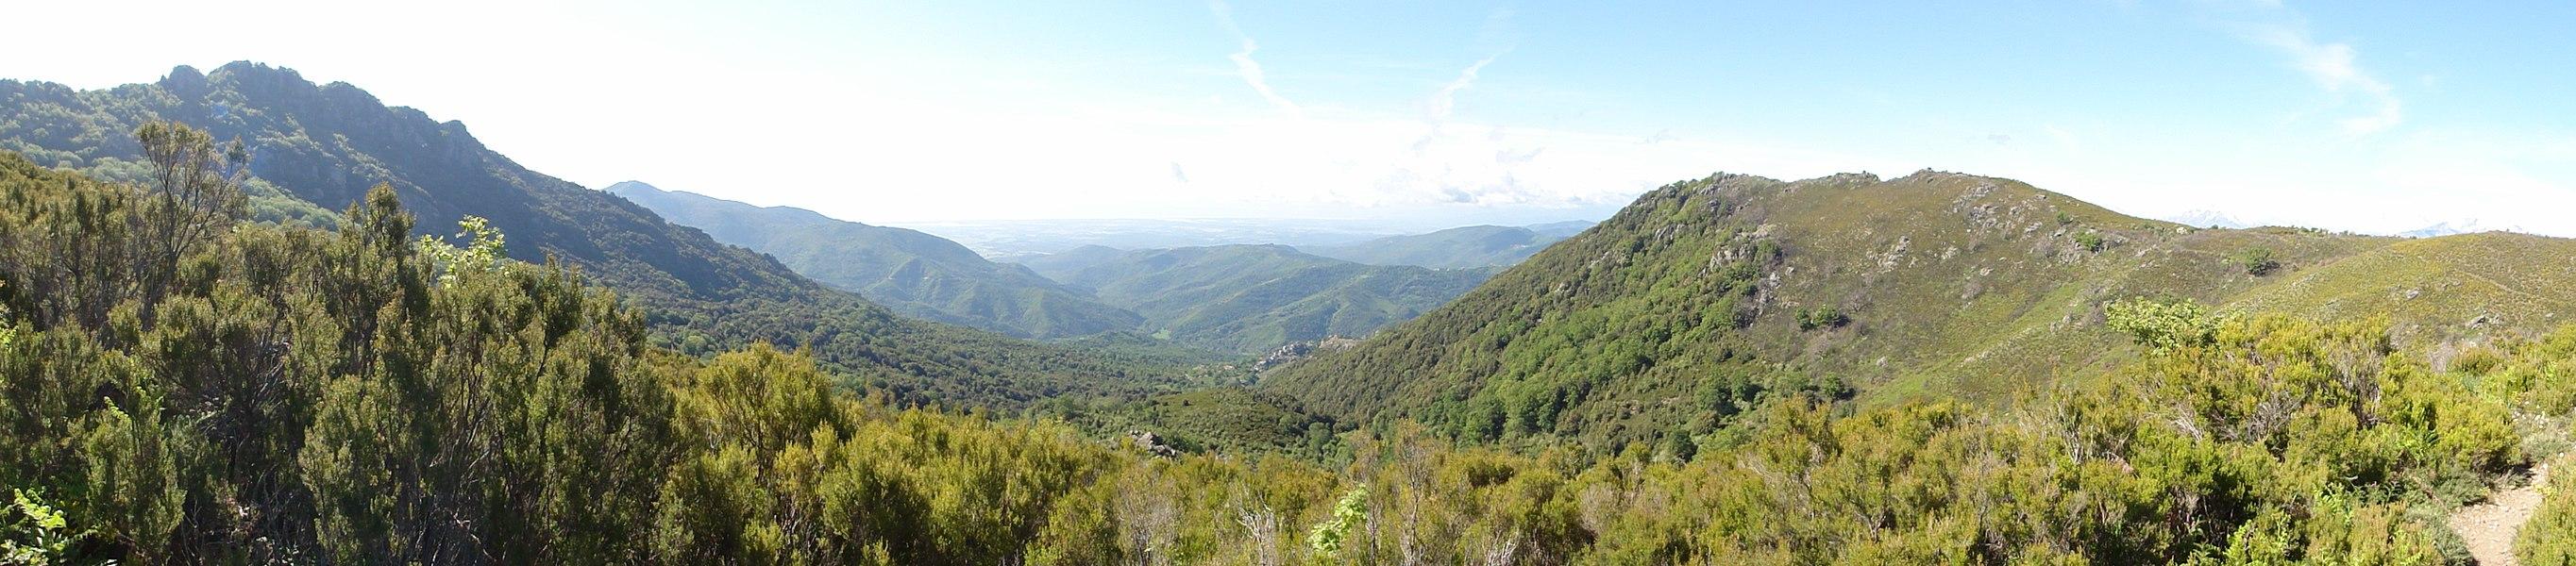 20234 Perelli, France